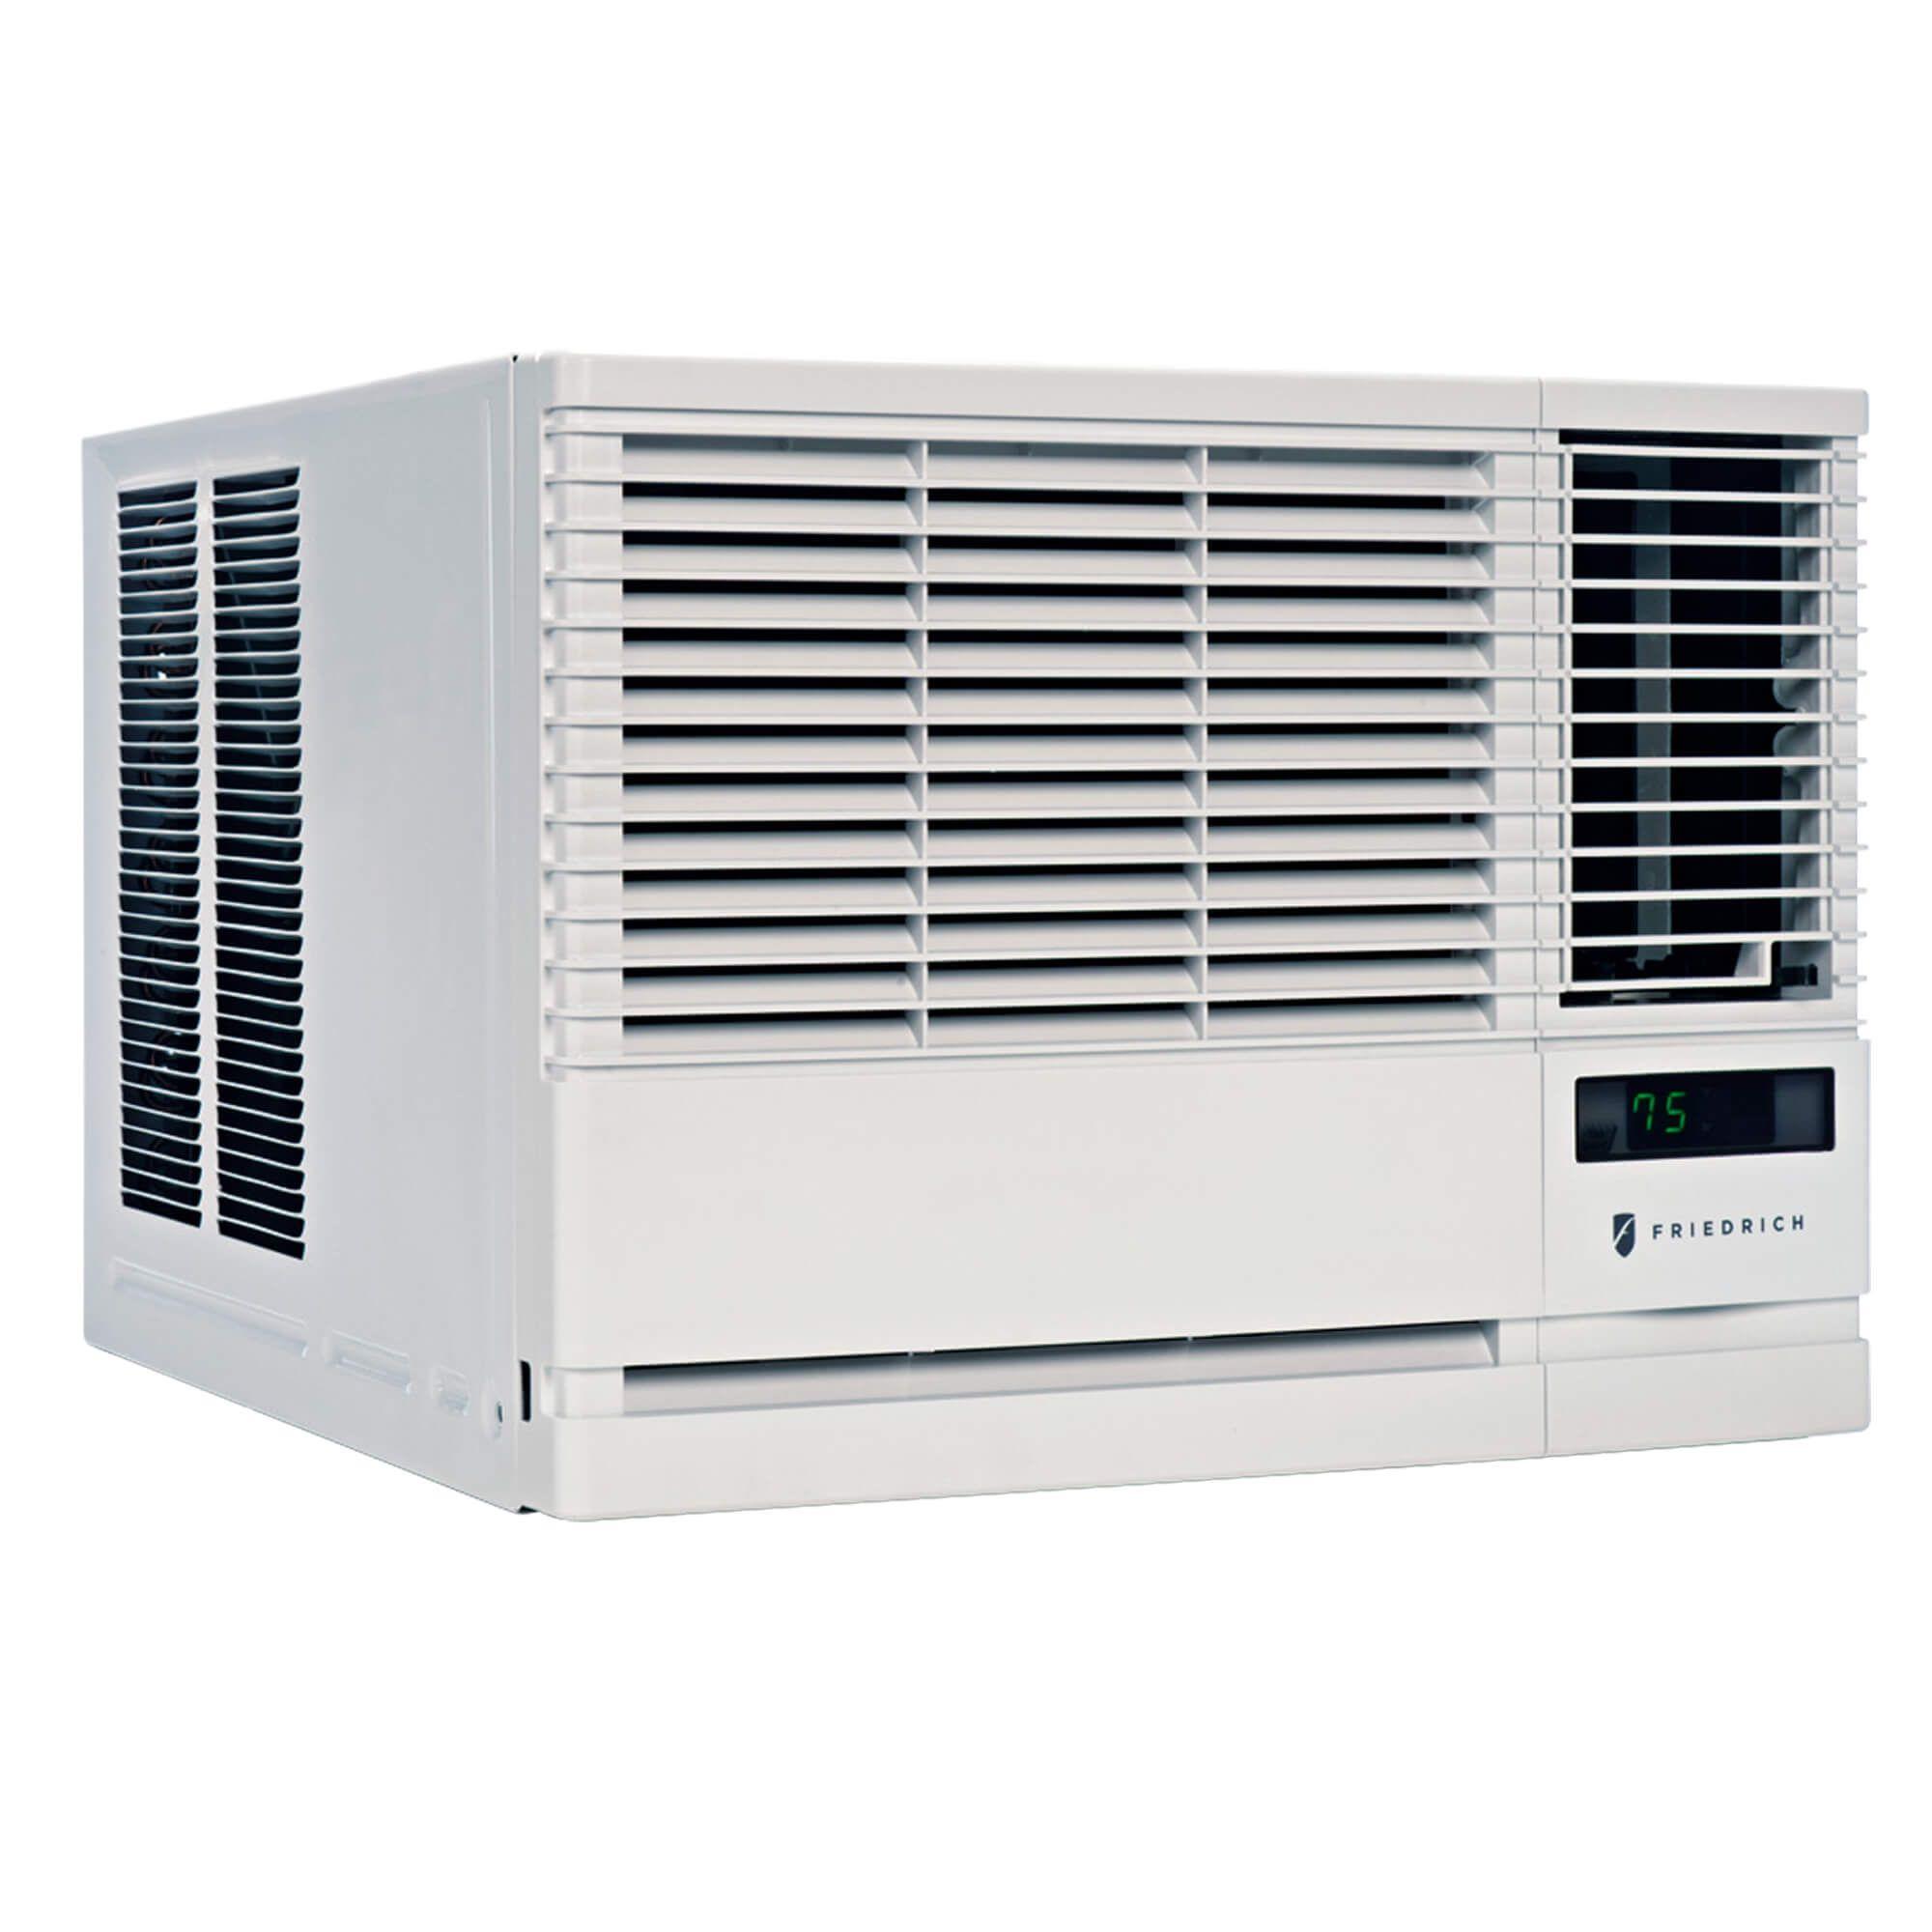 Friedrich Chill Series CP24G30B Window Air Conditioner in